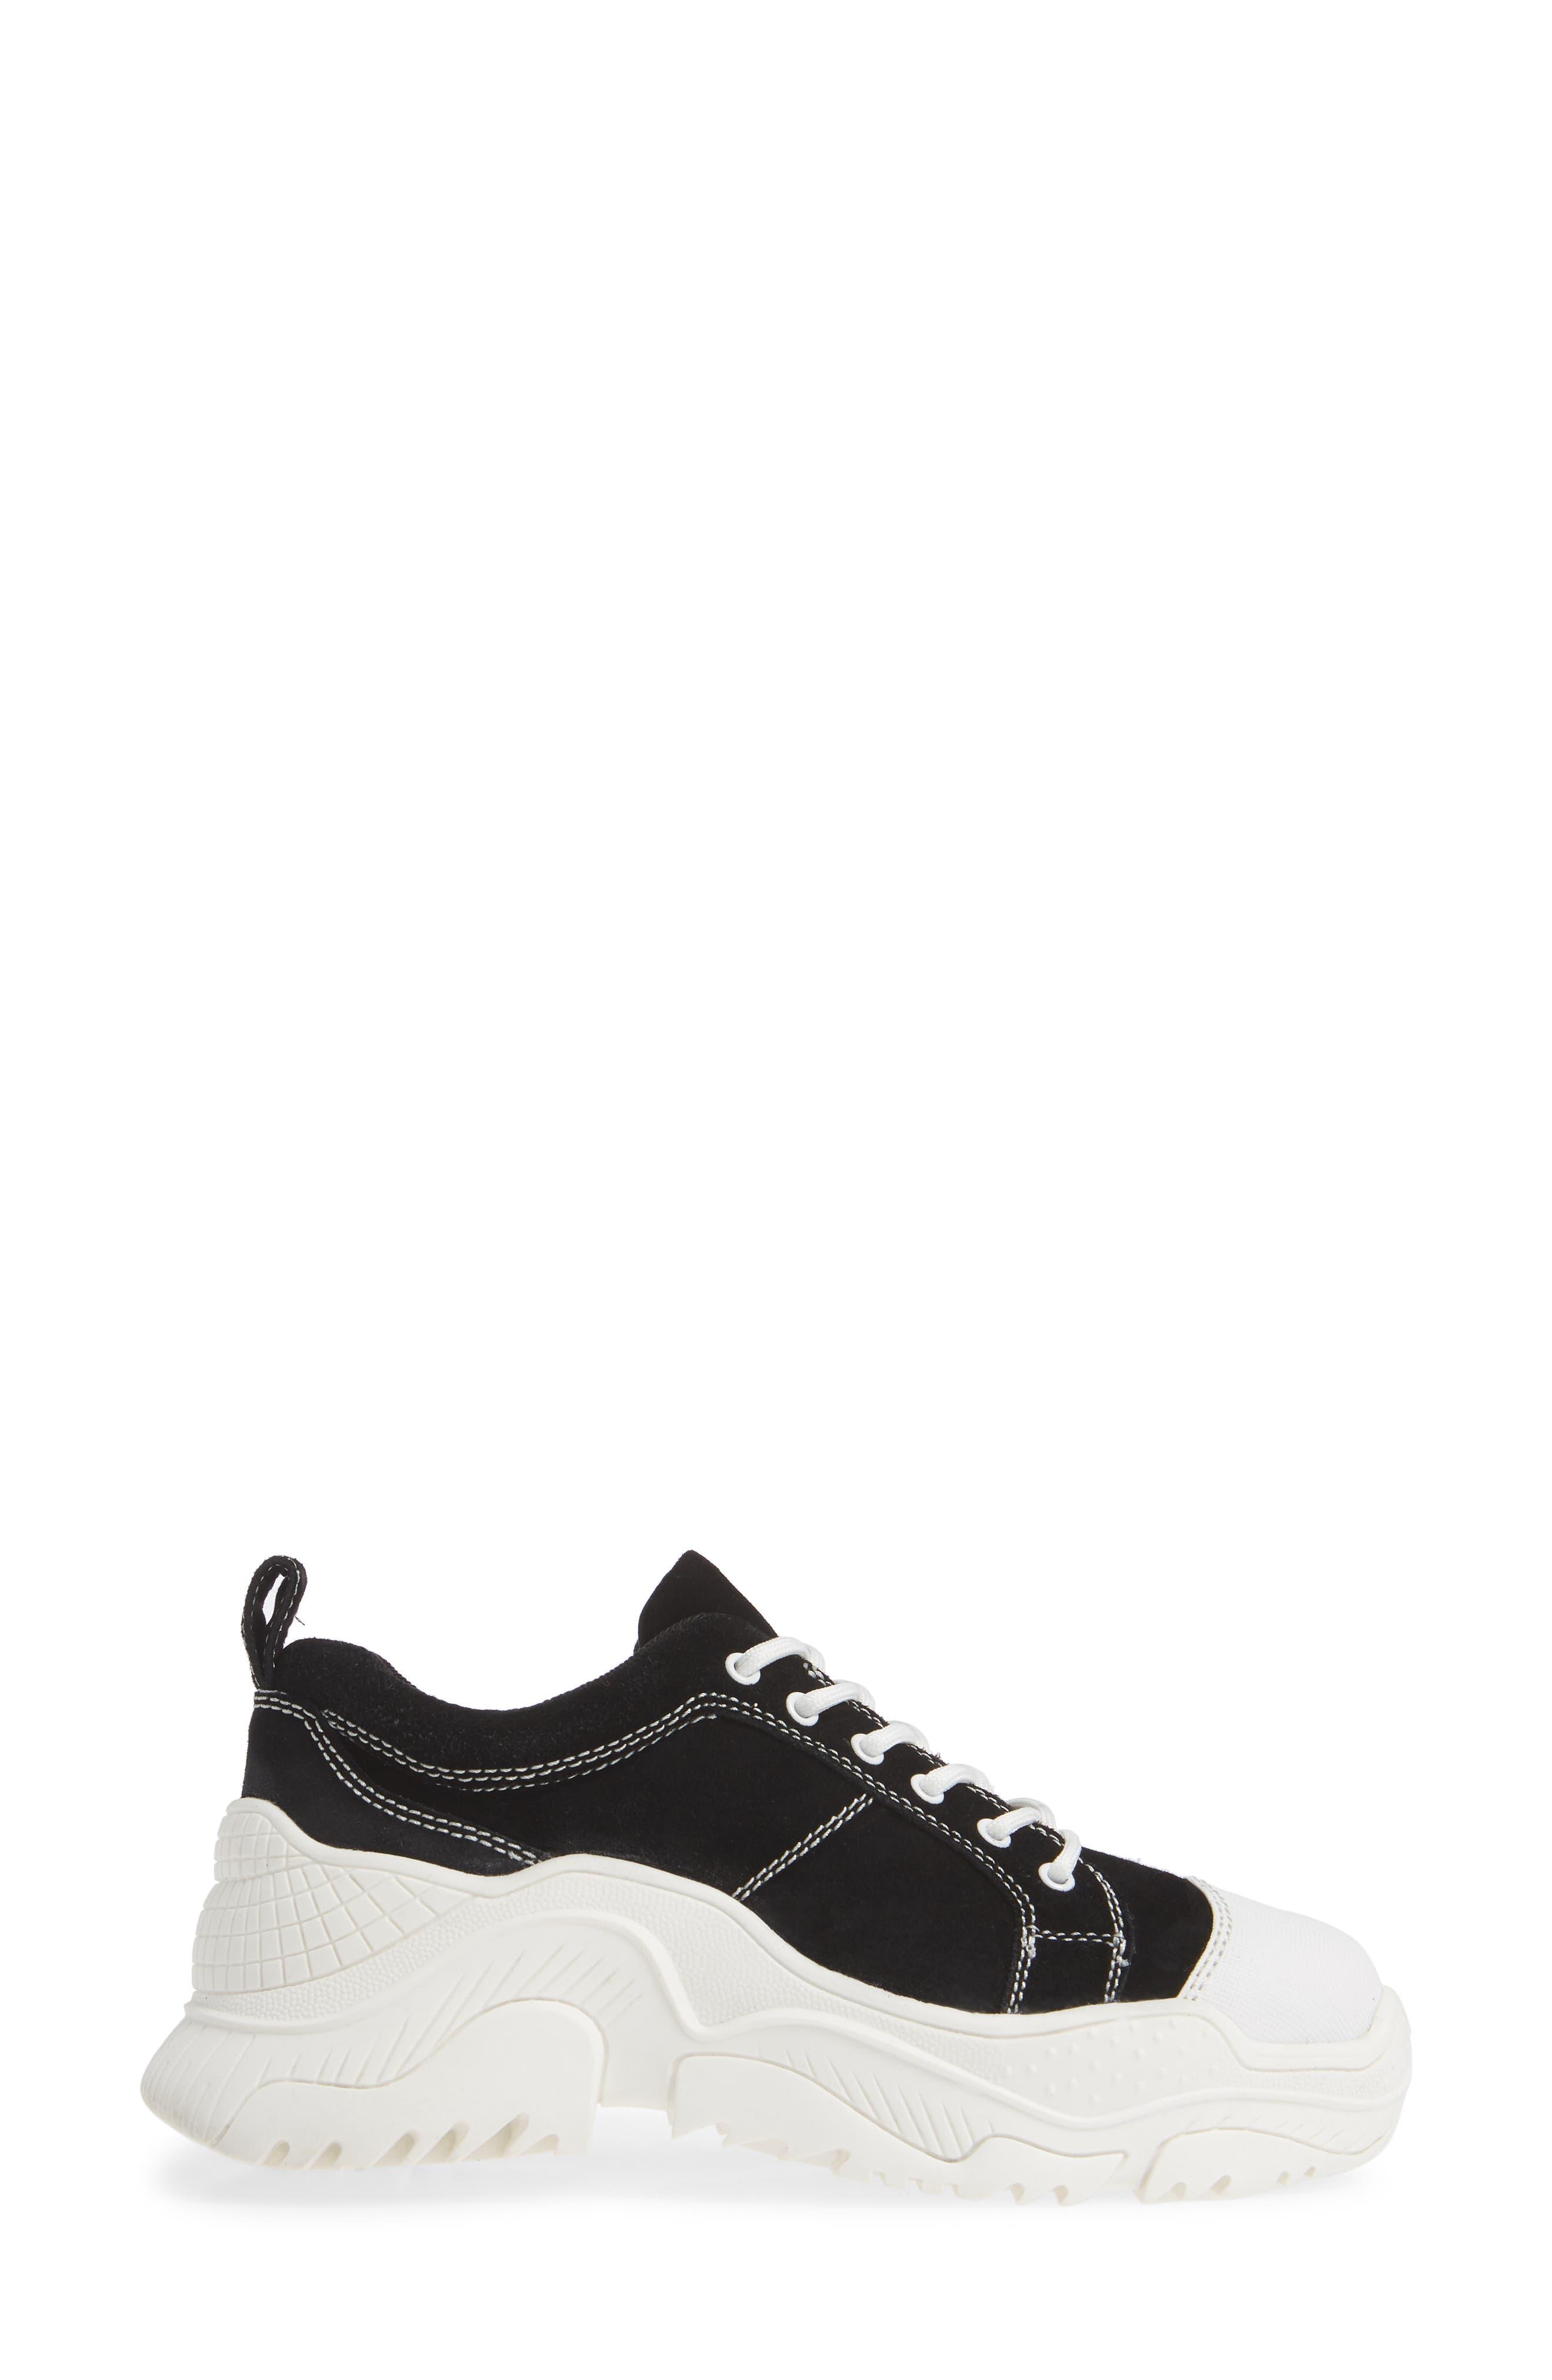 JEFFREY CAMPBELL, Remnant Sneaker, Alternate thumbnail 3, color, BLACK SUEDE WHITE